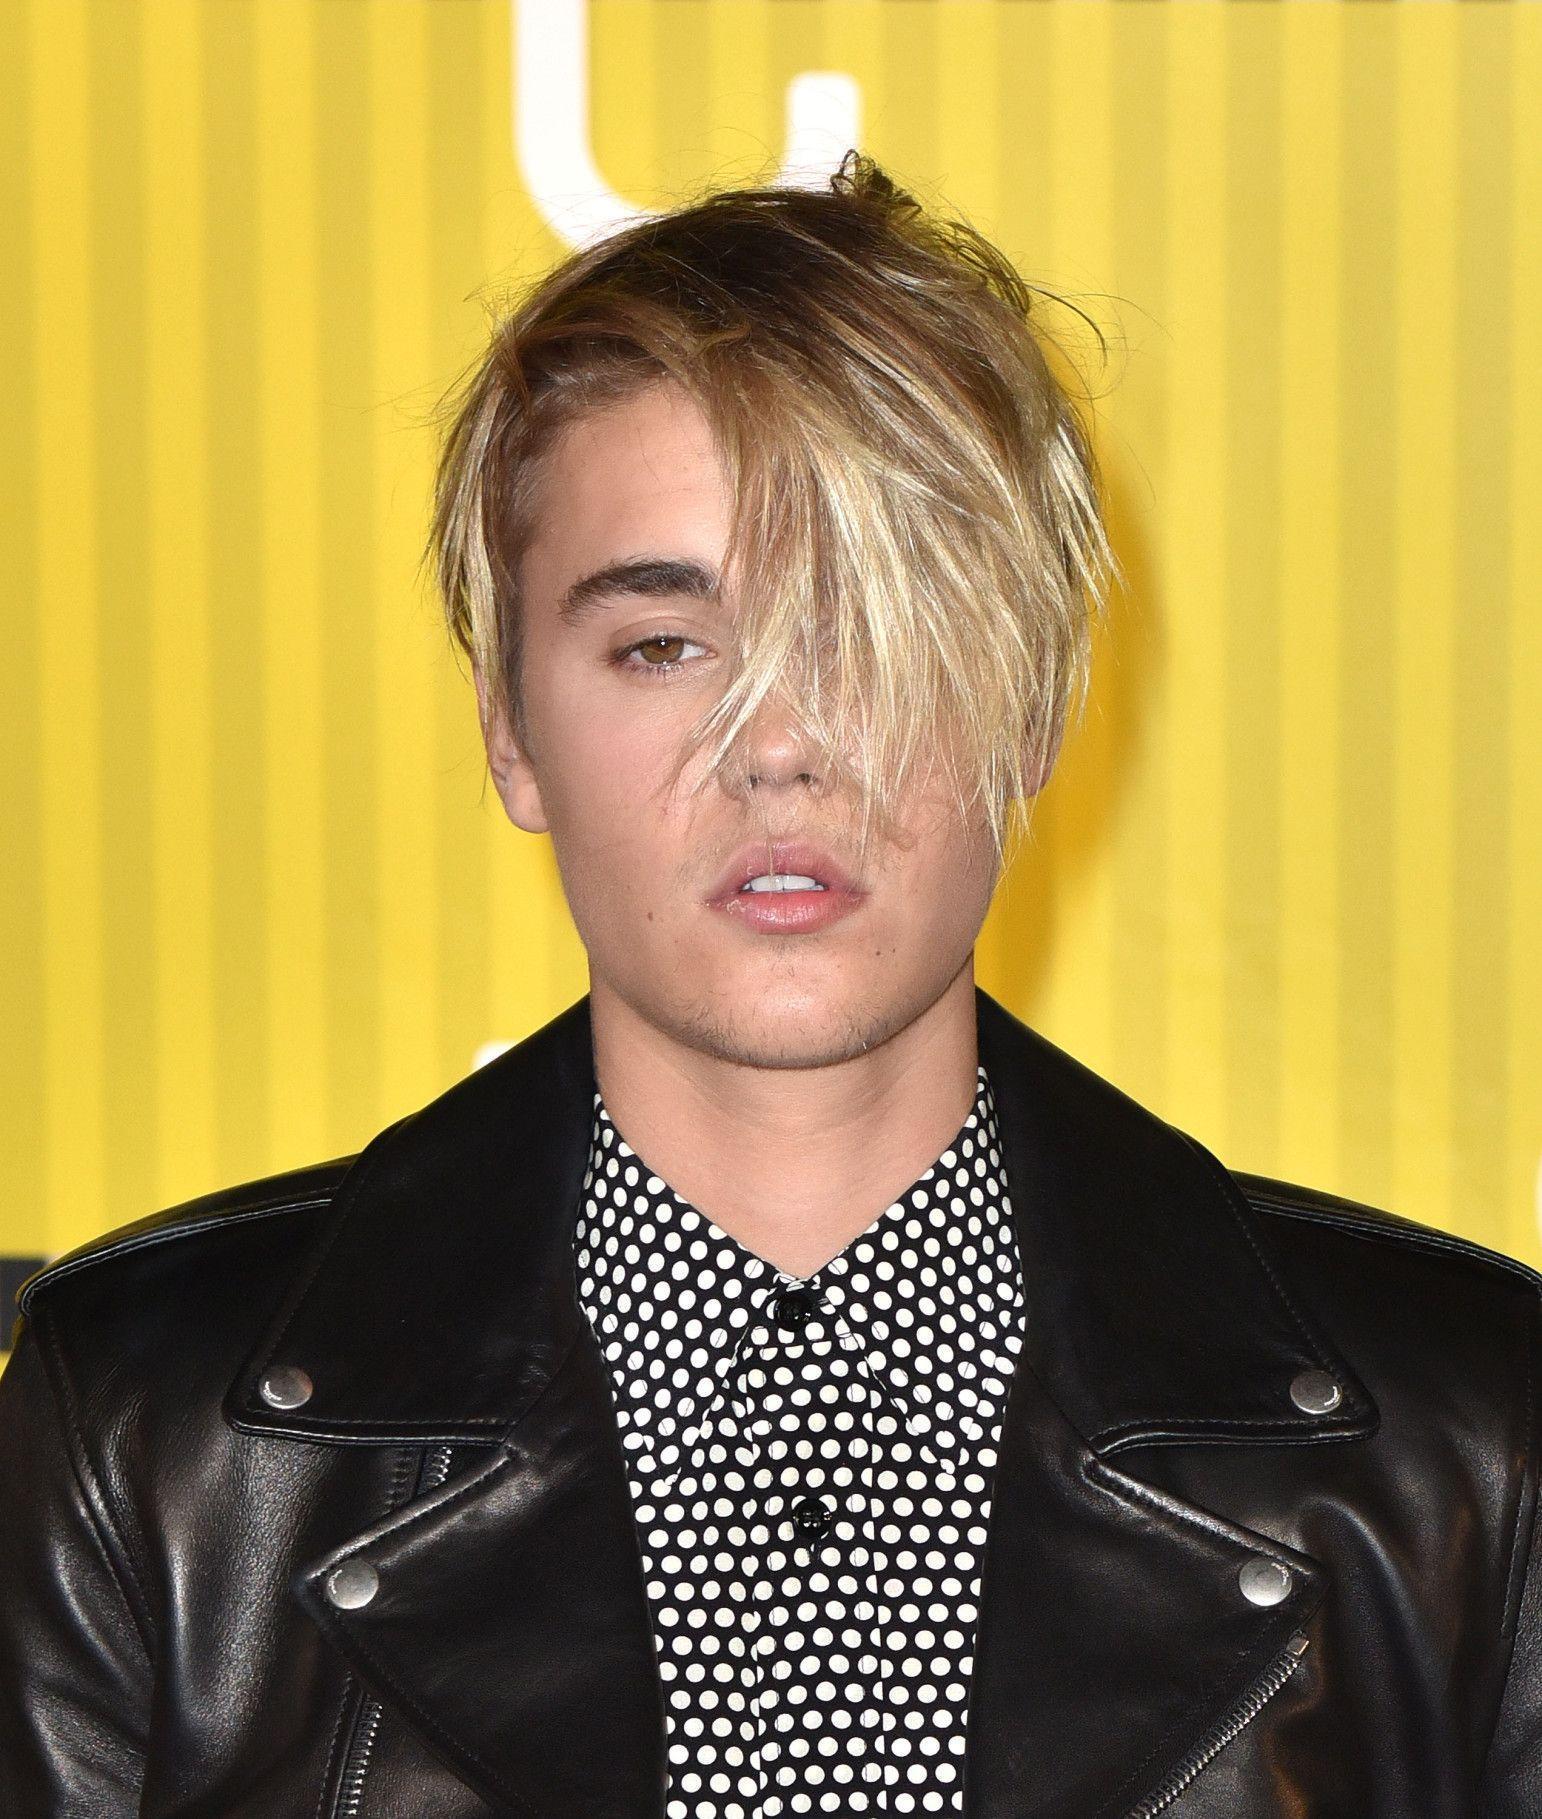 Justin Bieber New Wallpapers 2017 - Wallpaper Cave